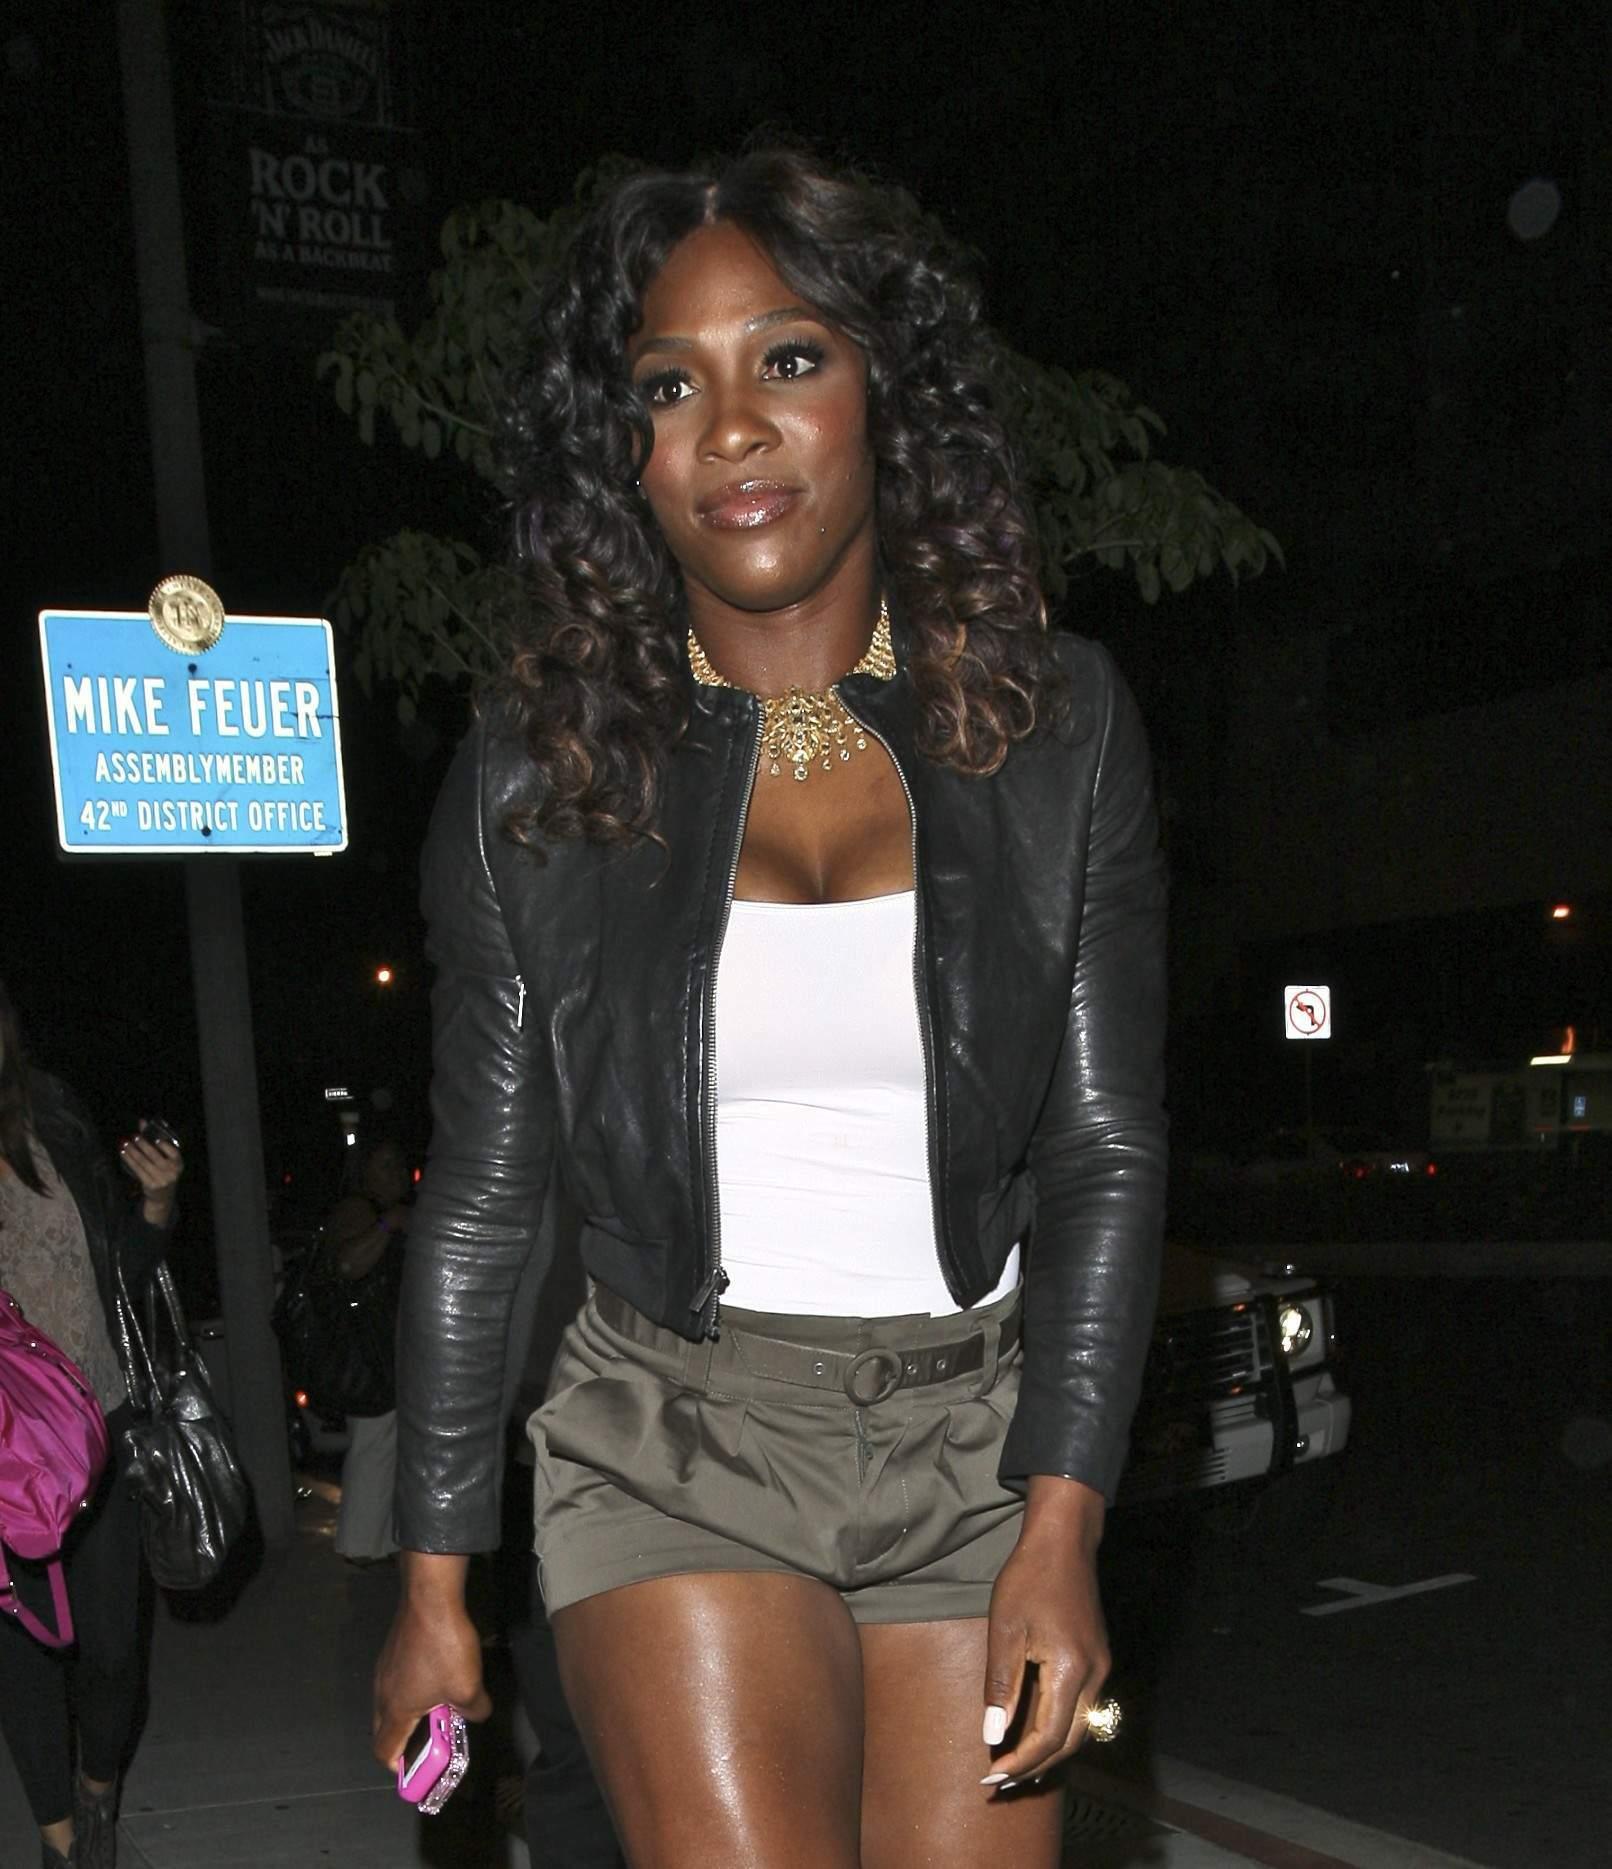 Serena Williams BoaSteakhouseJuly13201115_123_90lo.jpg